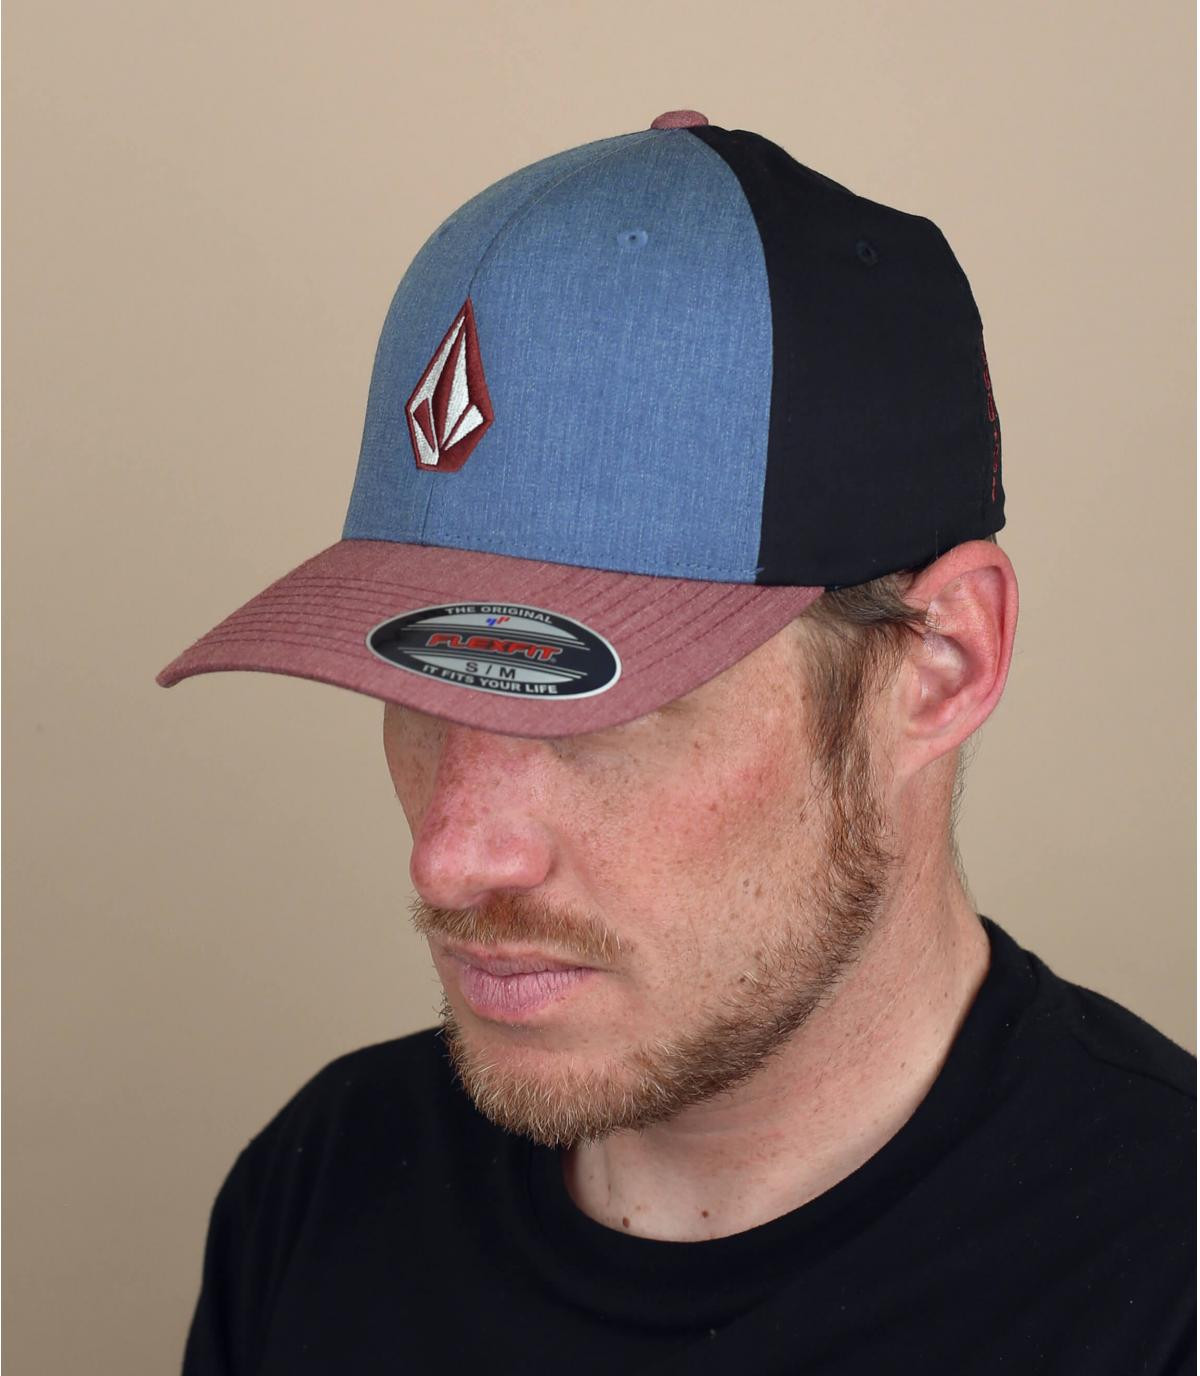 casquette Volcom bleu rouge